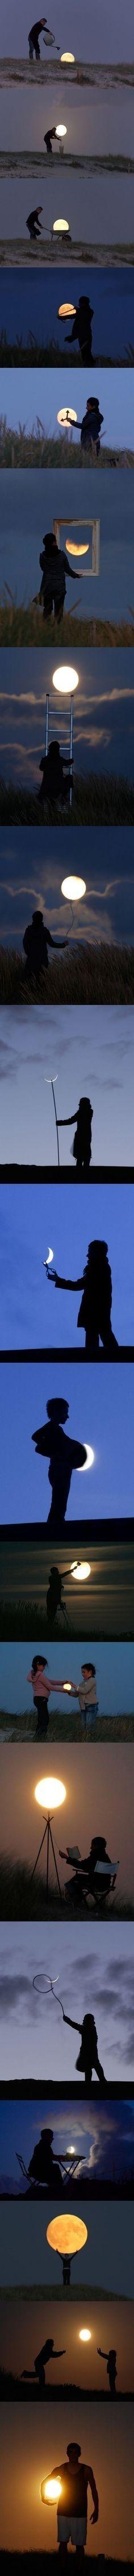 Awesome Moon Photo Ideas . Wauw @Betsy Buttram Bernardi Frederick Turner Jansen